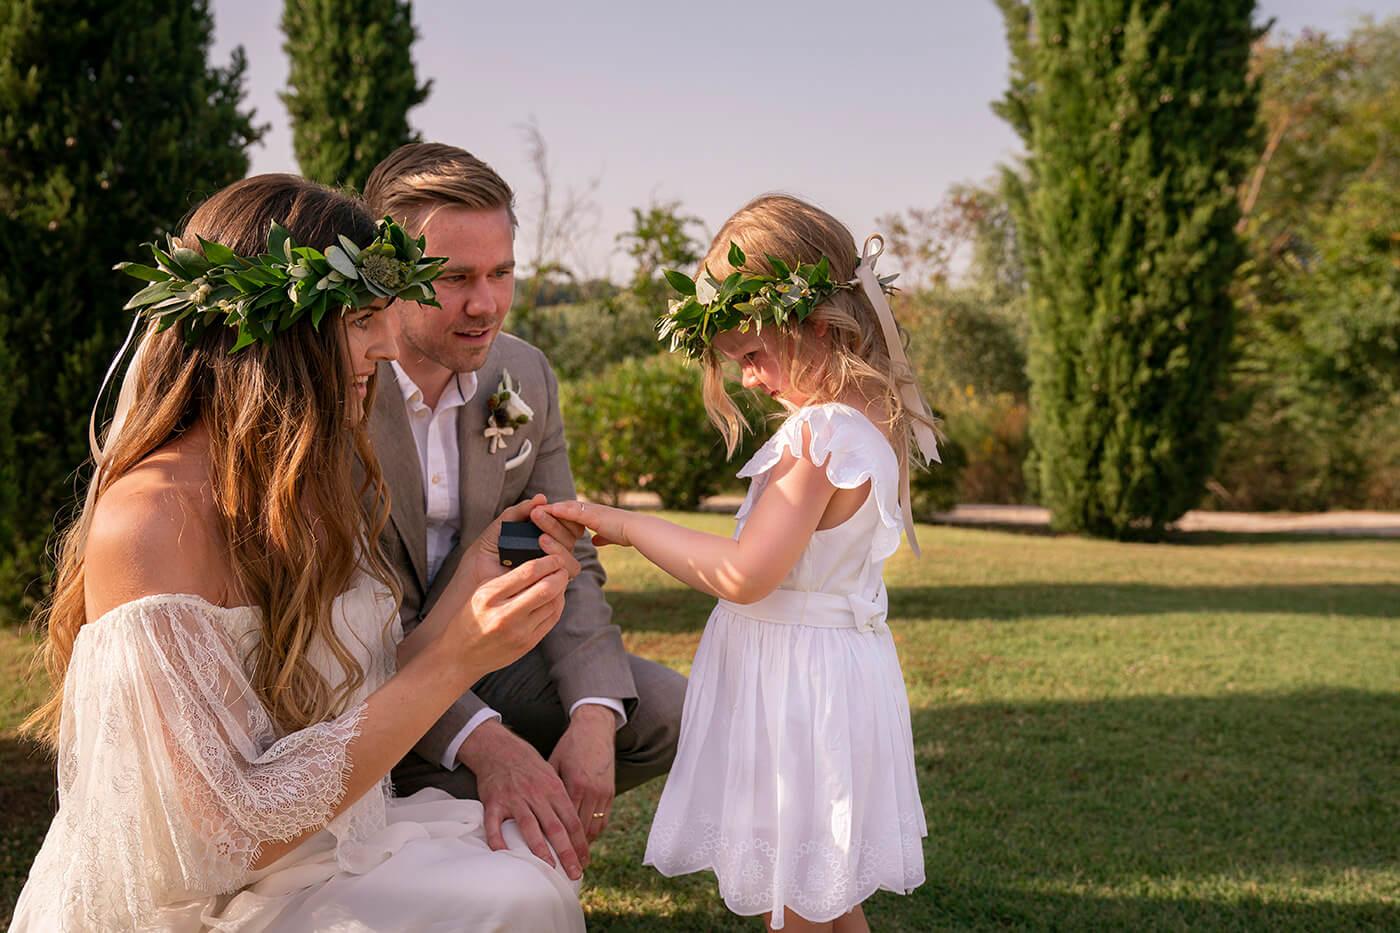 Wedding Photographer Arezzo - Duccio Argentini